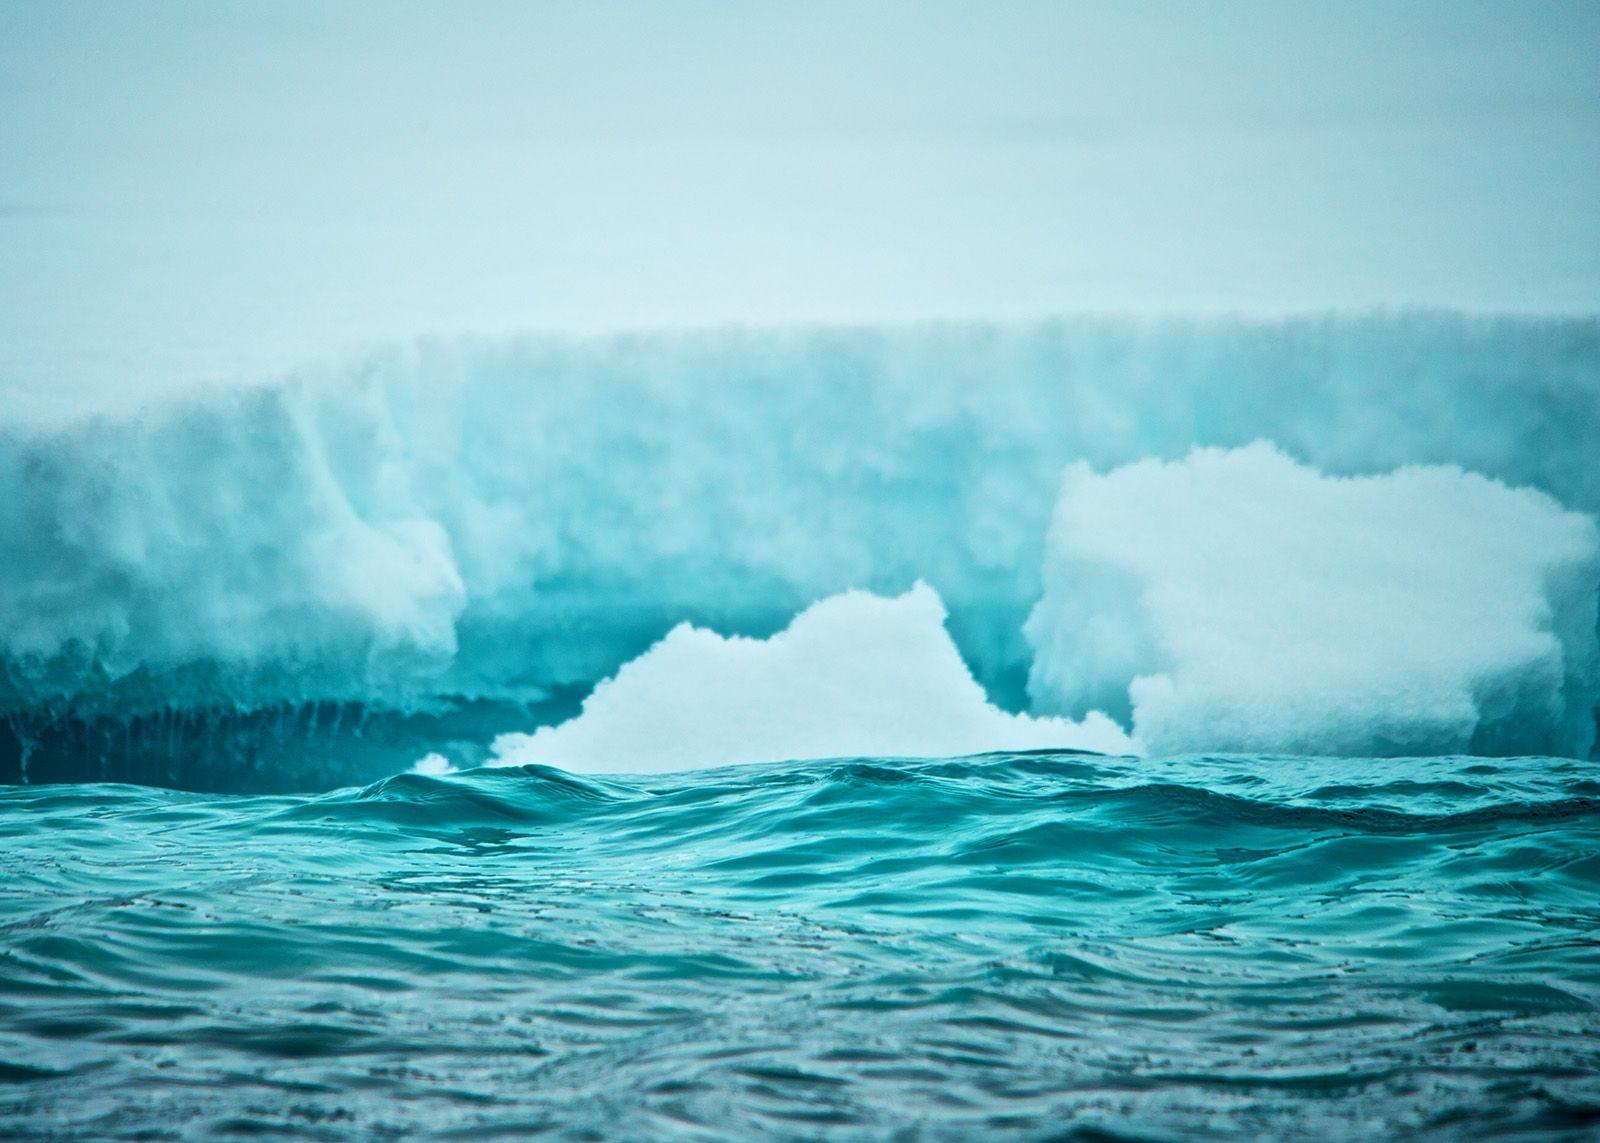 Ishav i Arktis av Peder Aaserud Eikeland